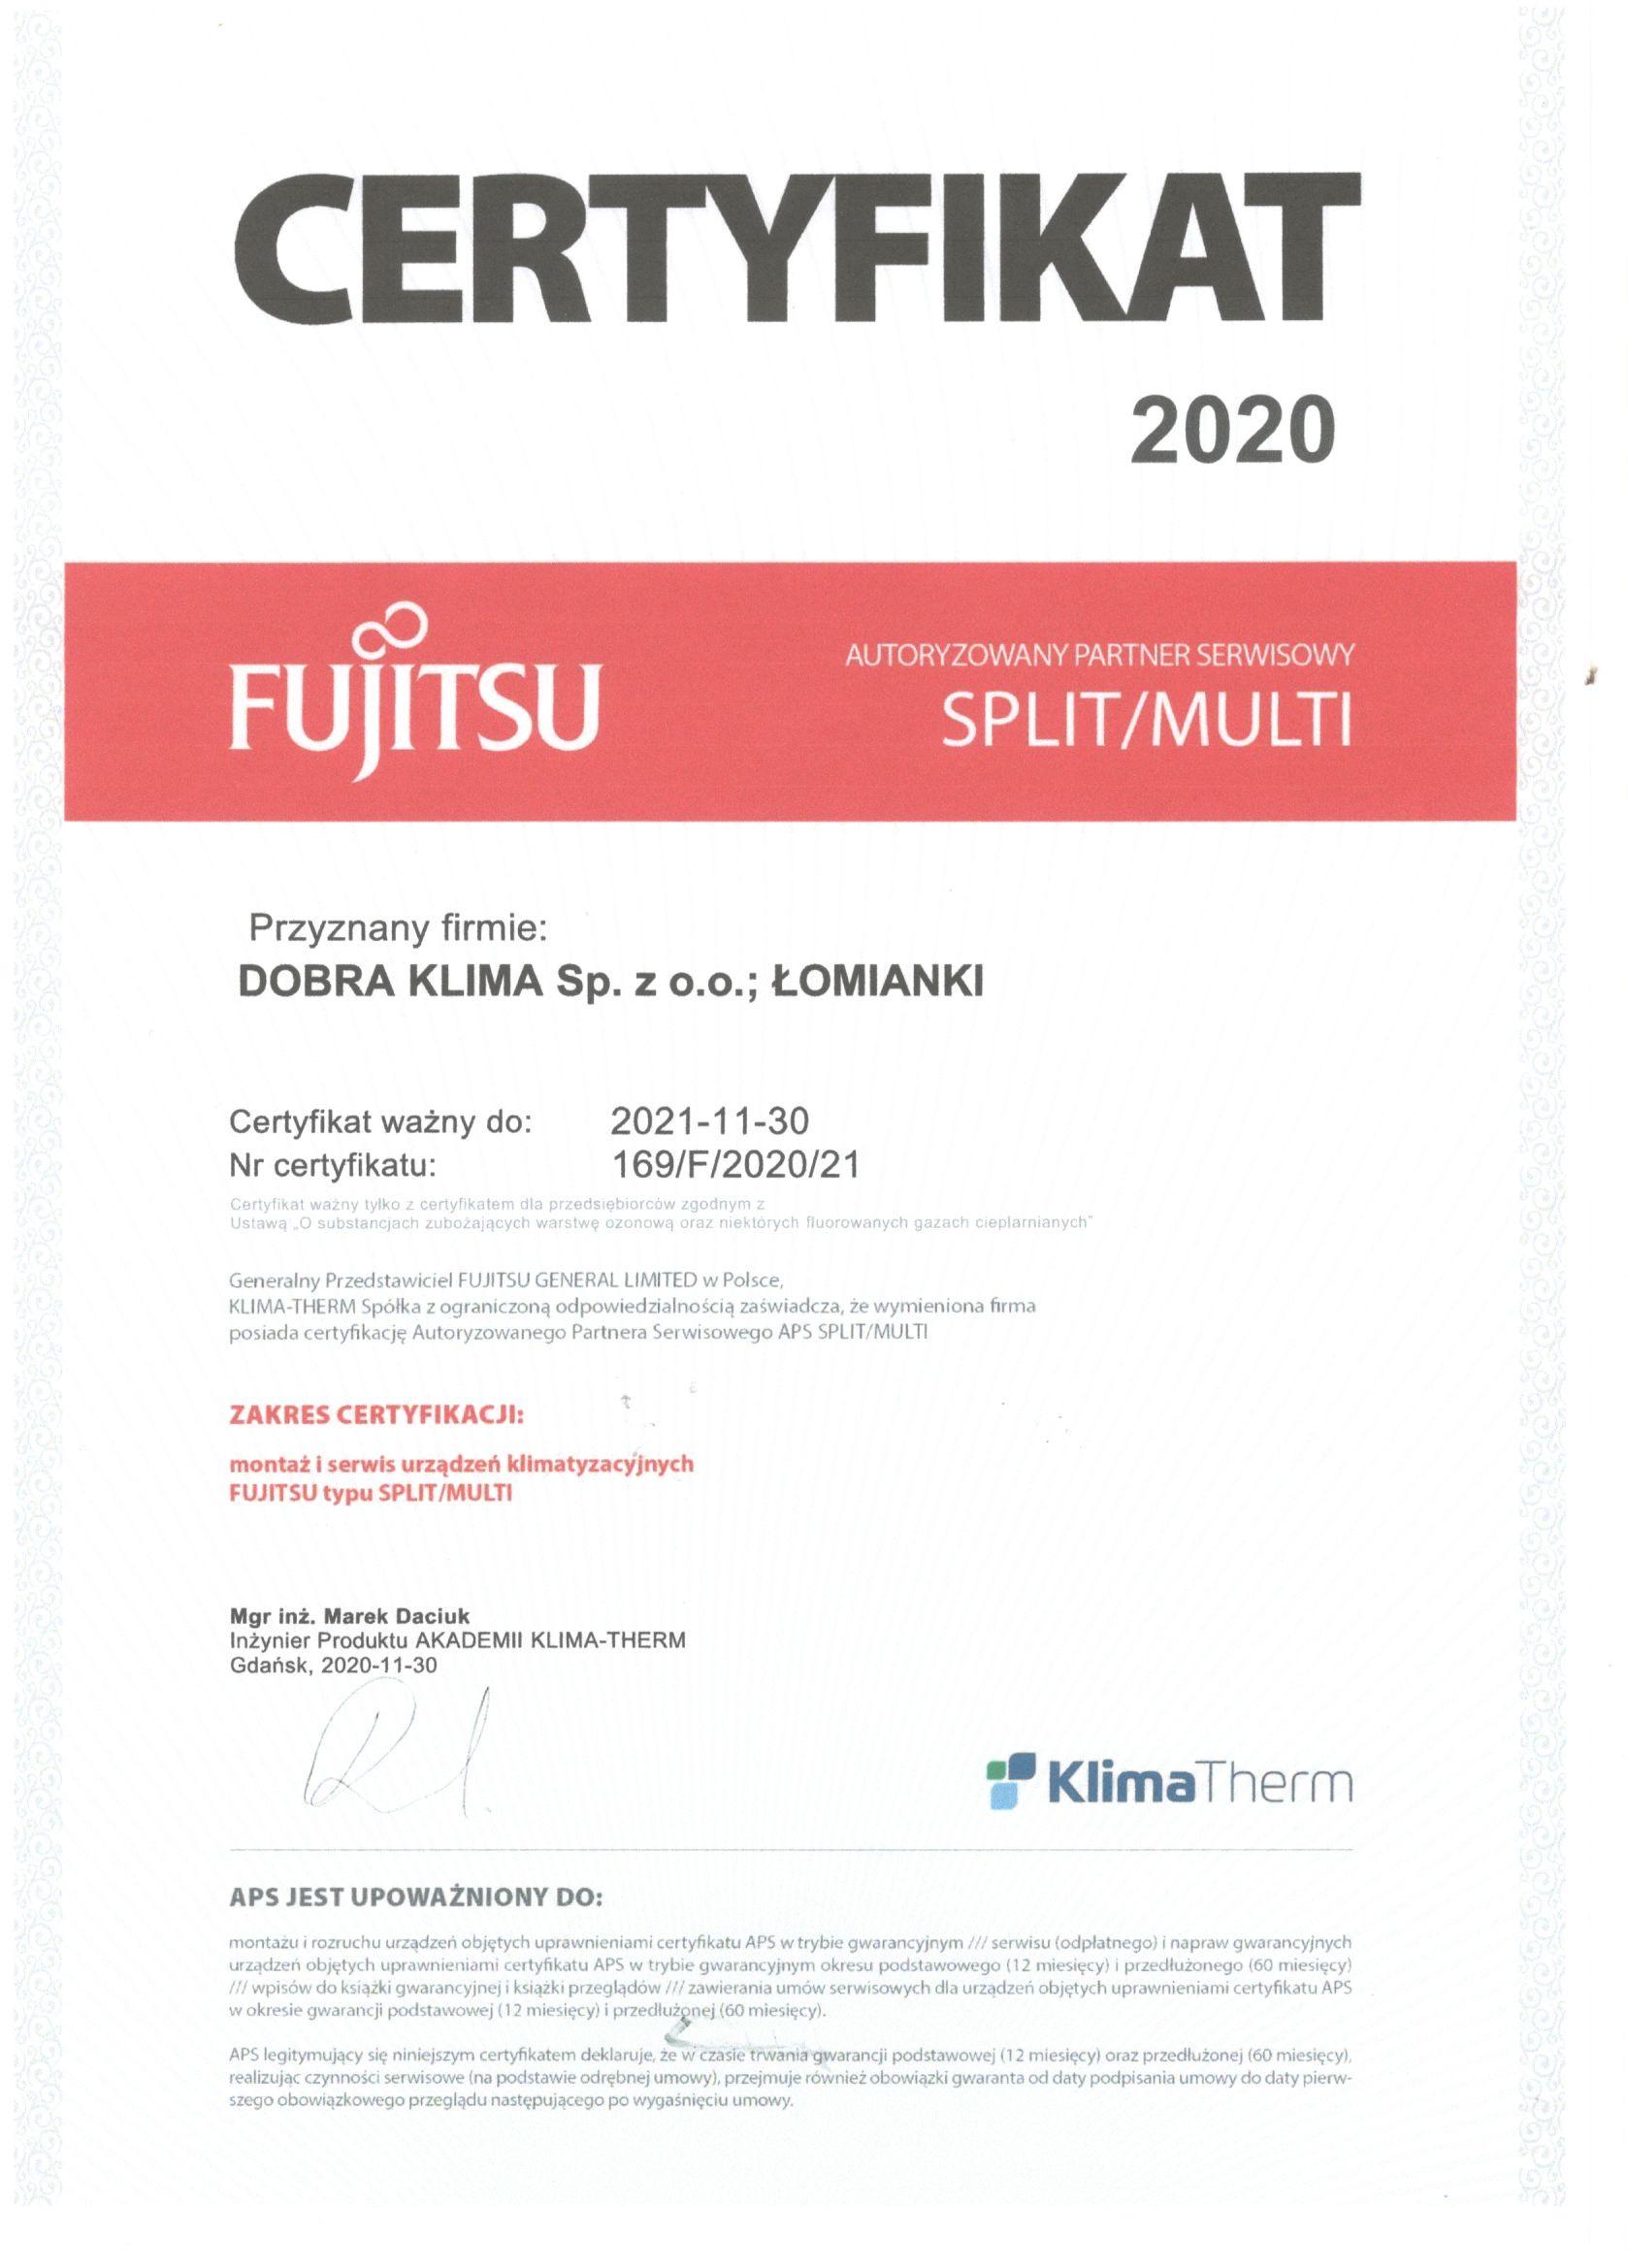 2020-certyfikat-fujitsu